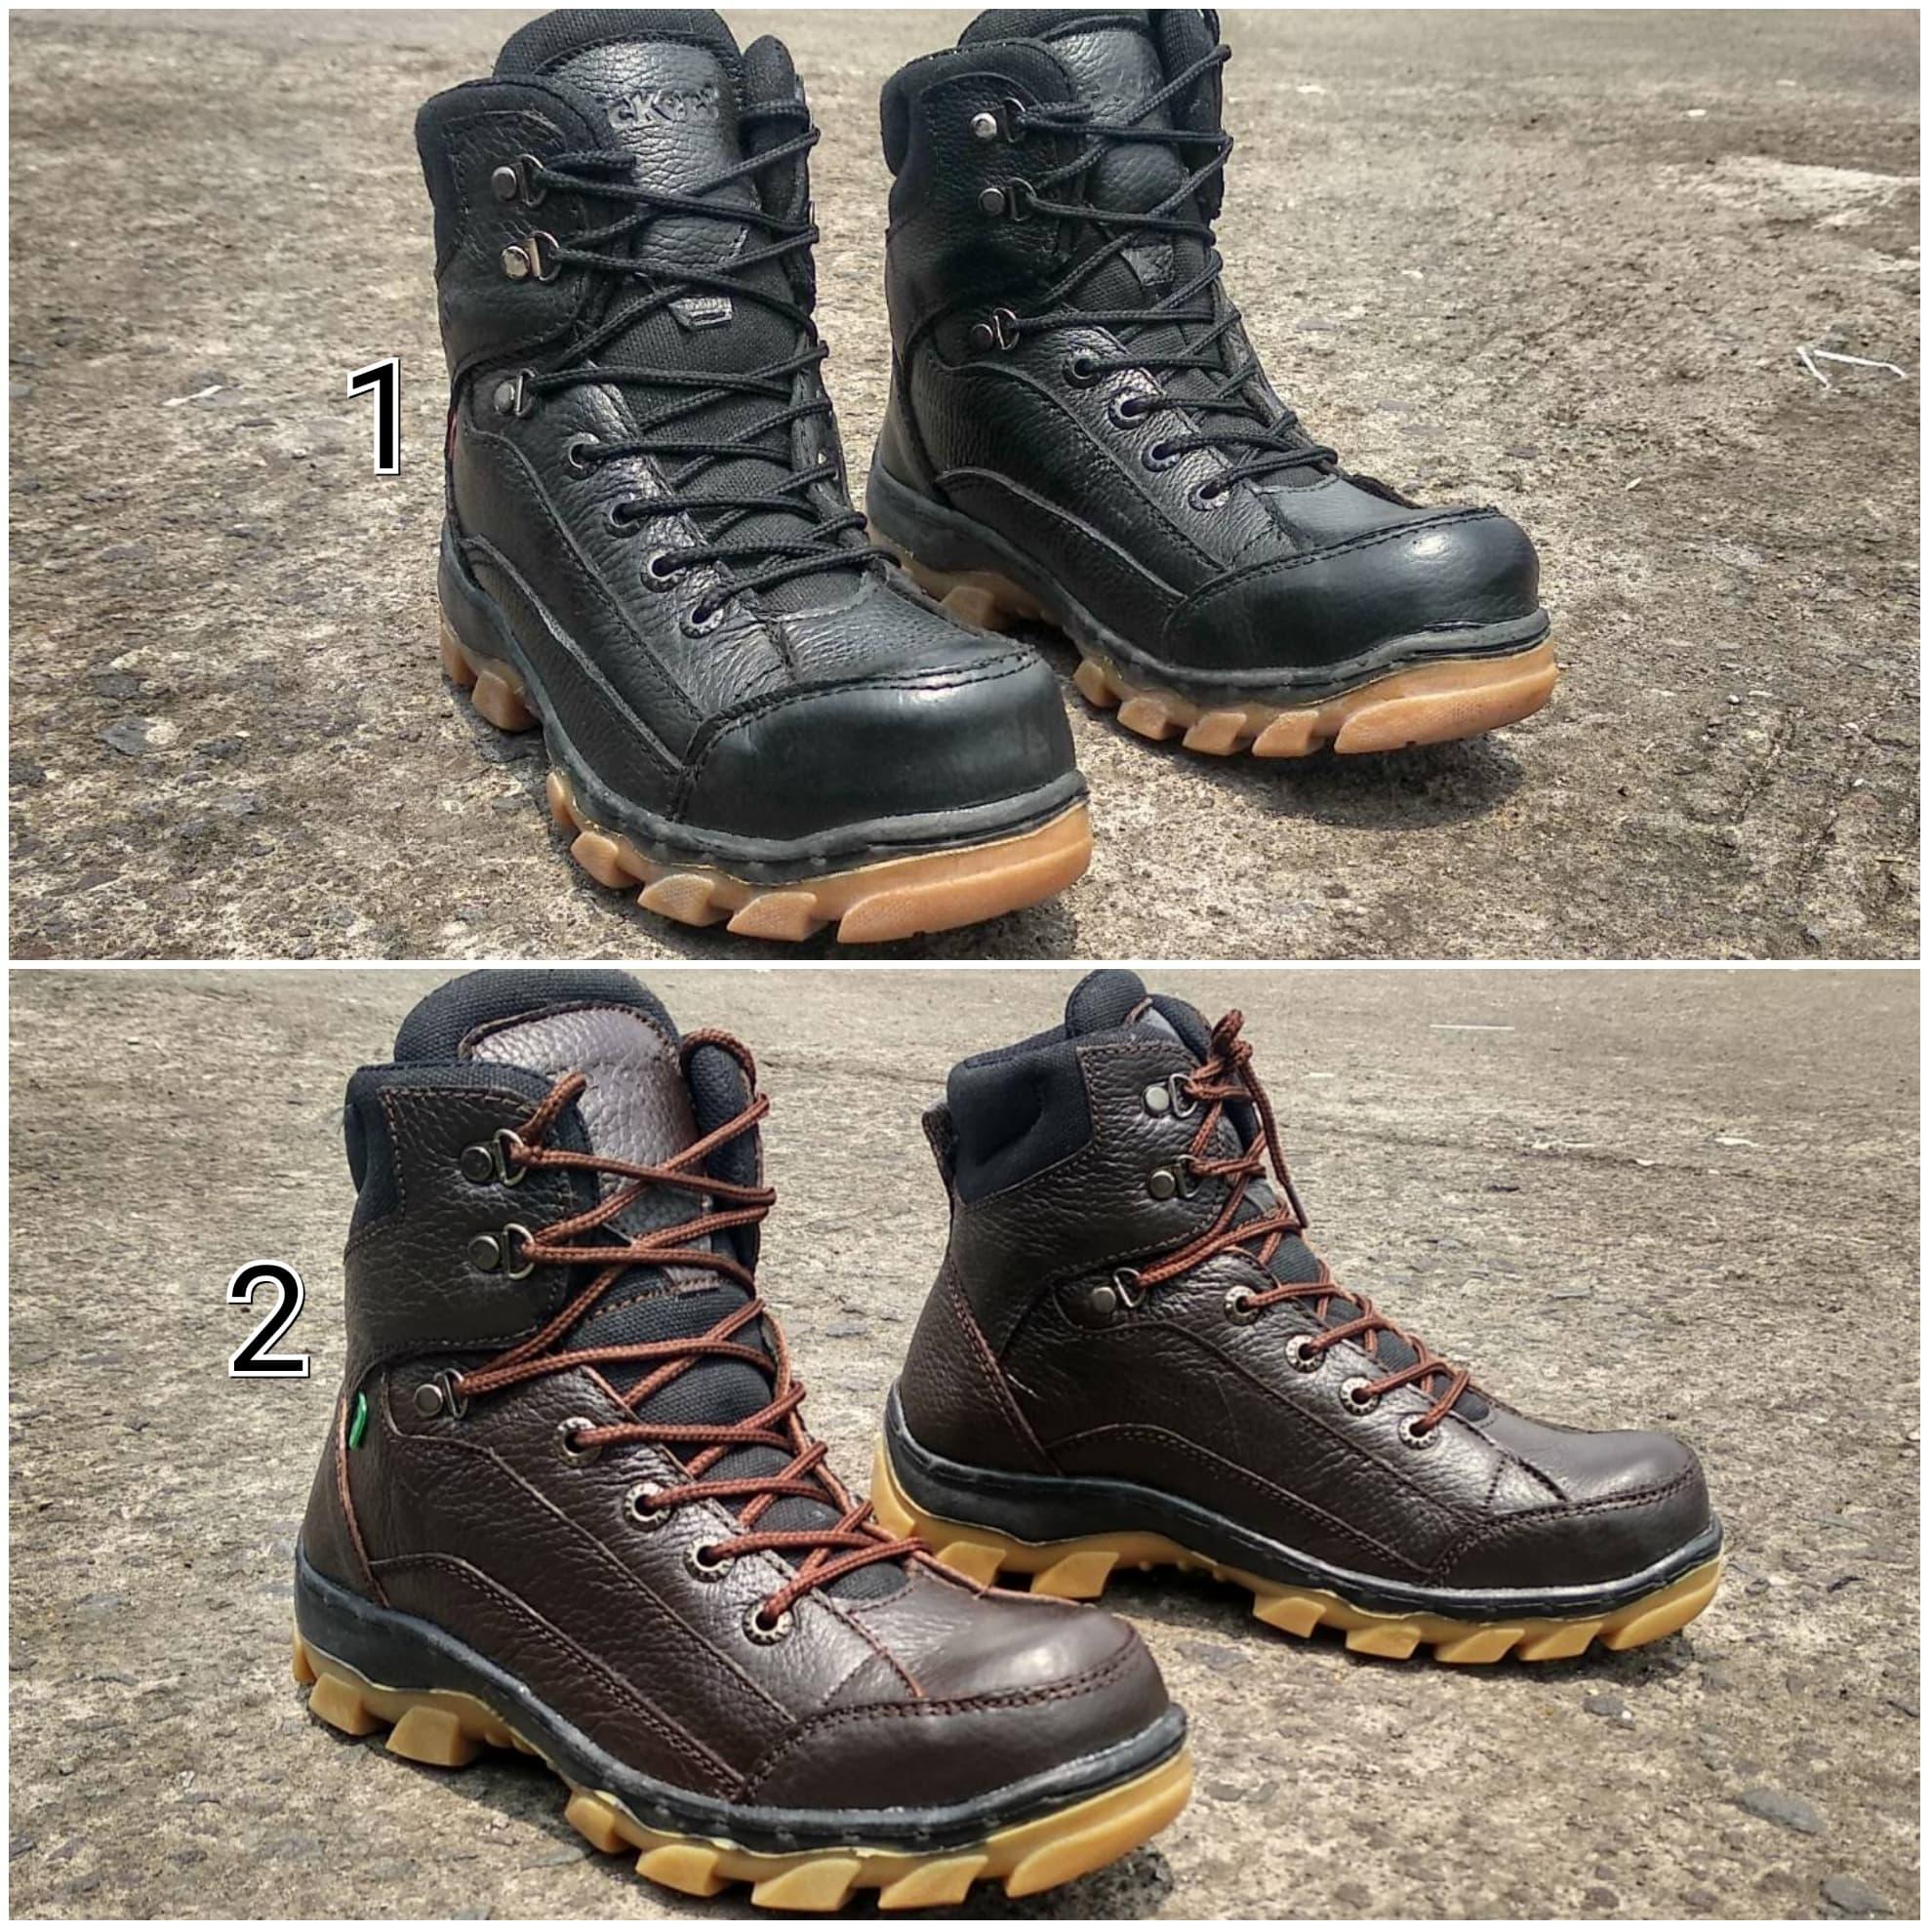 MURAH Sepatu Kickers Tracking Kulit Asli Safety Ujung Besi Boots Pria 86485d4416